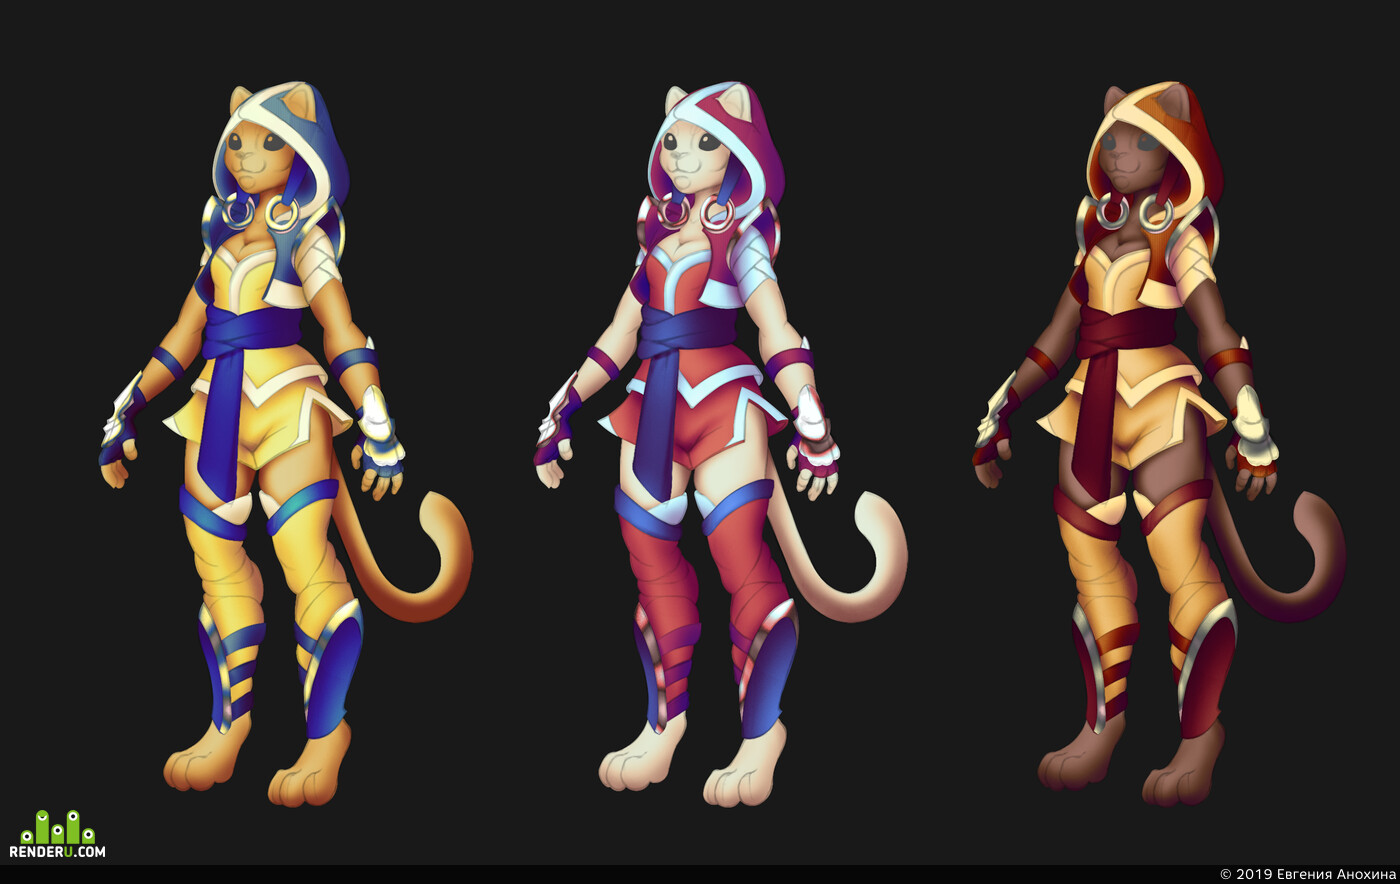 Кошка, монах, дизайн персонажа